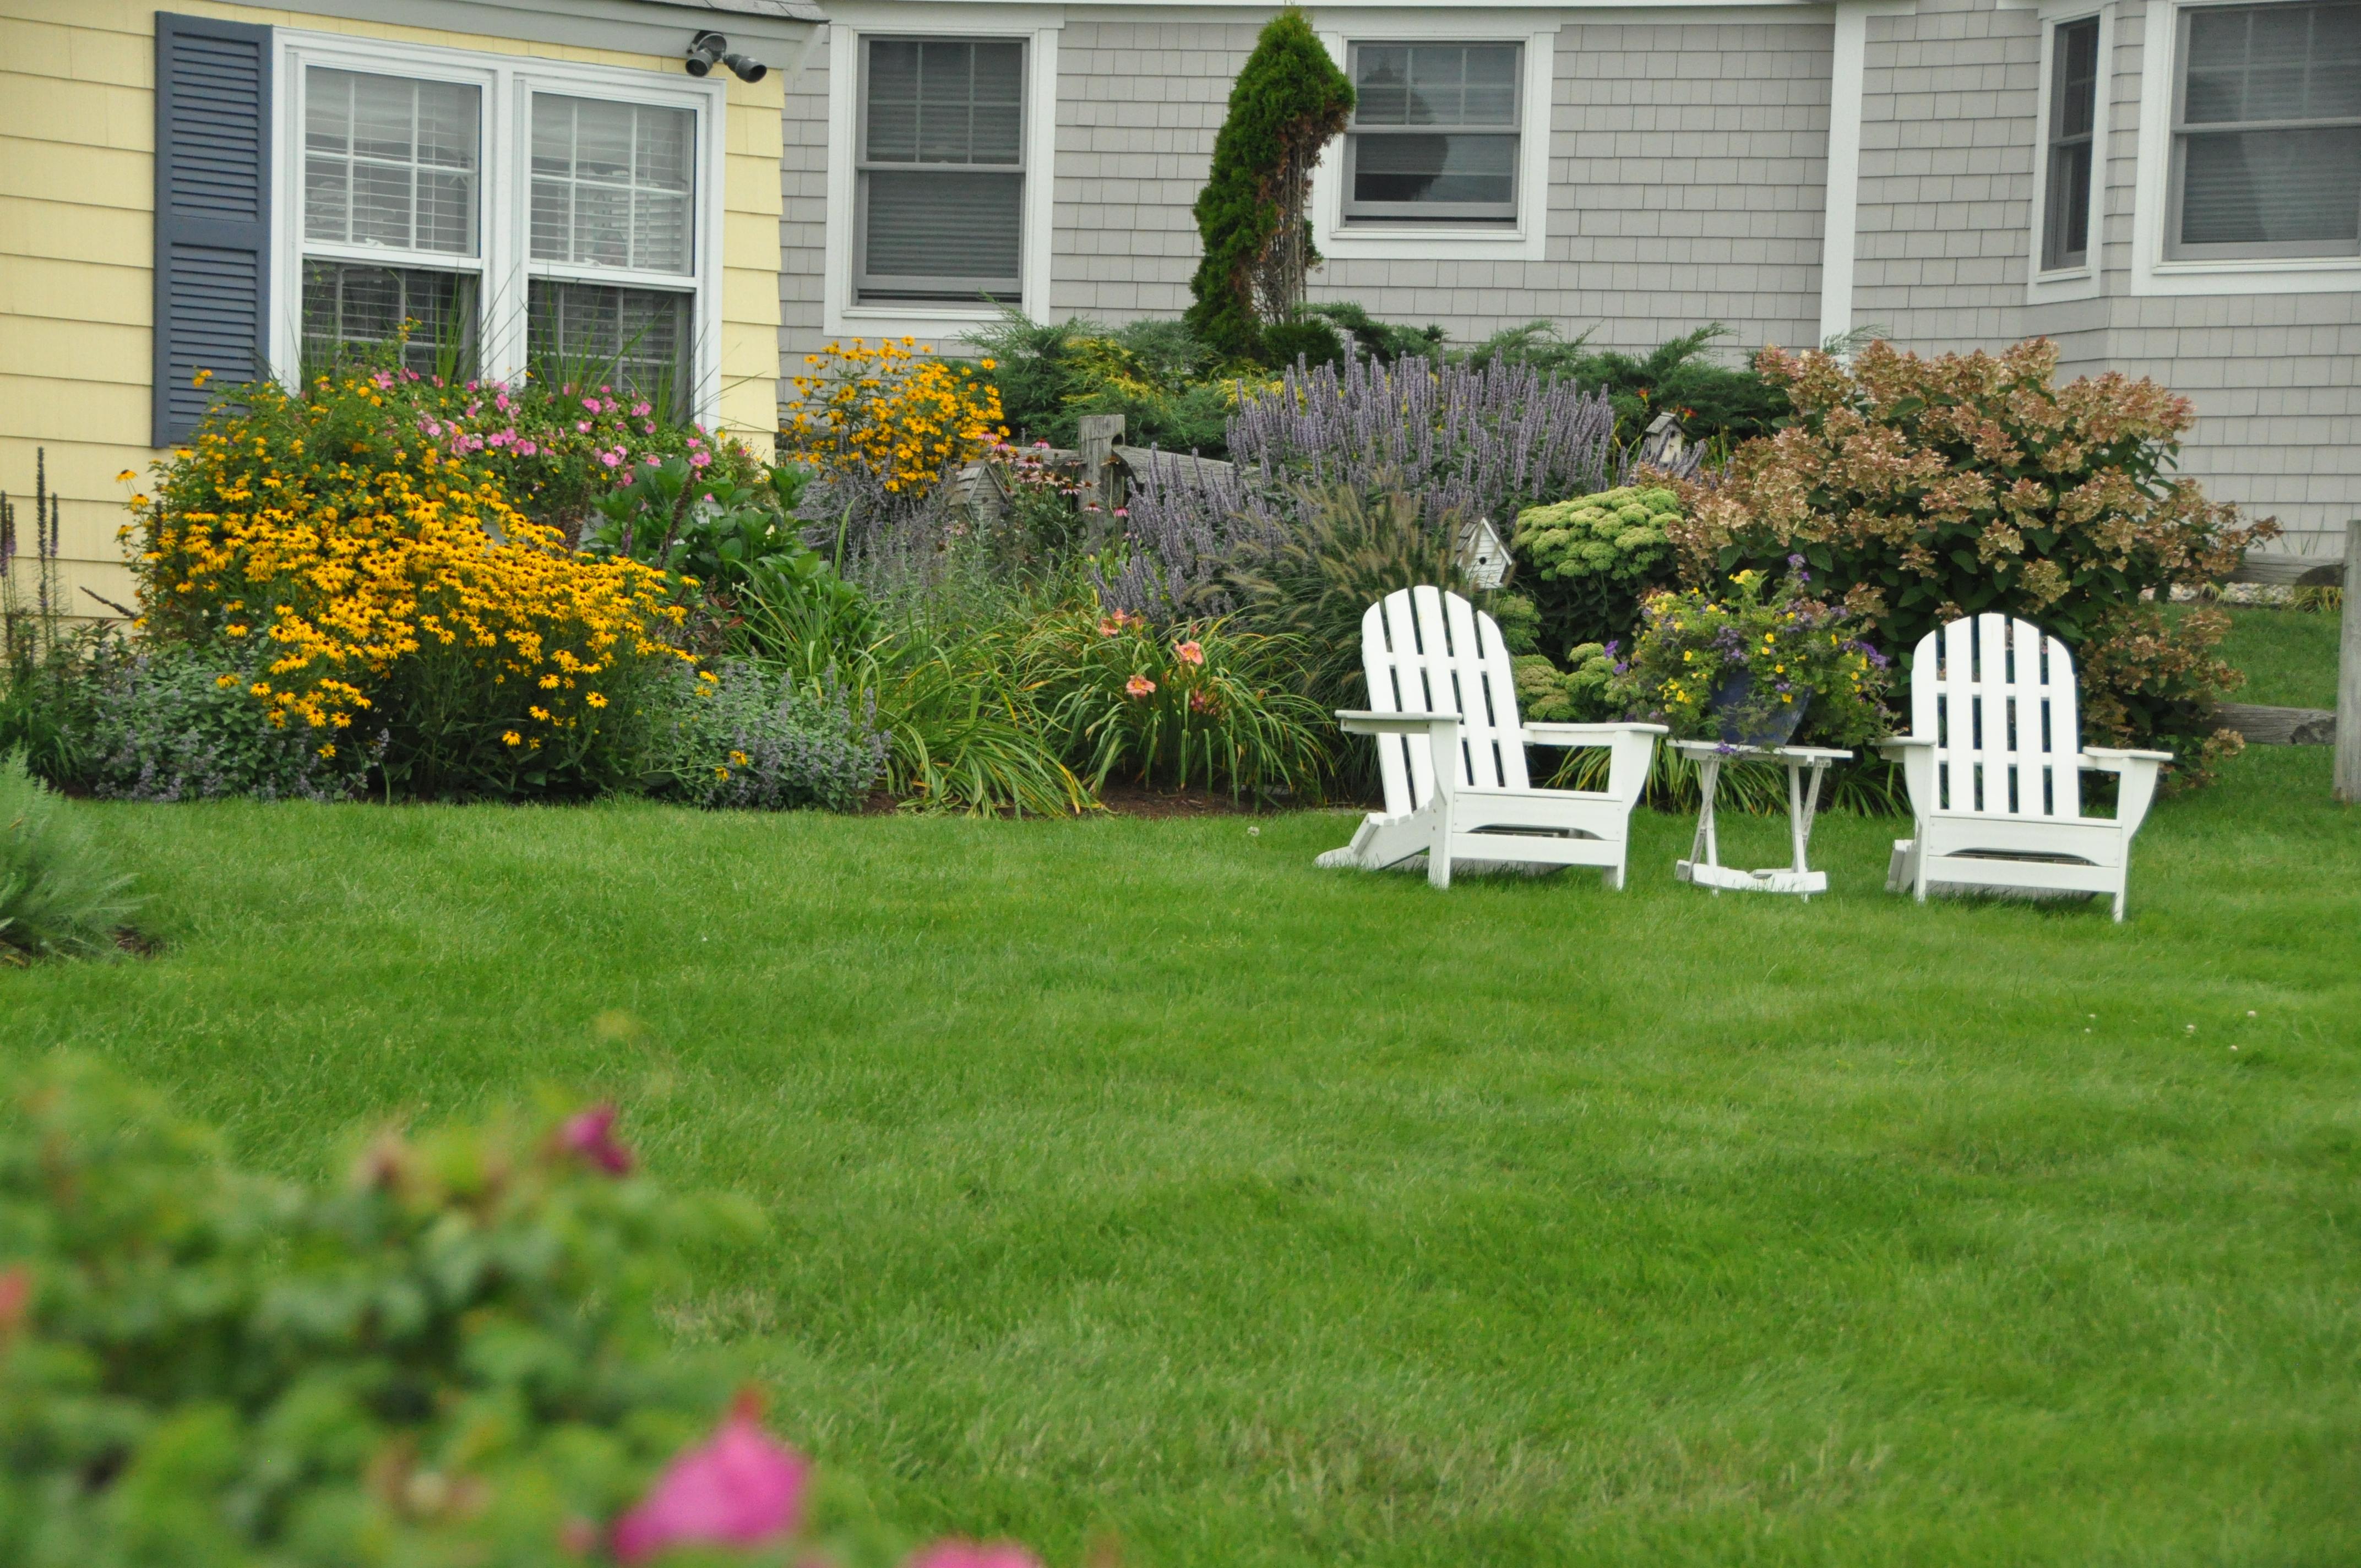 Using environmentally friendly programs, you can still enjoy a lush lawn.